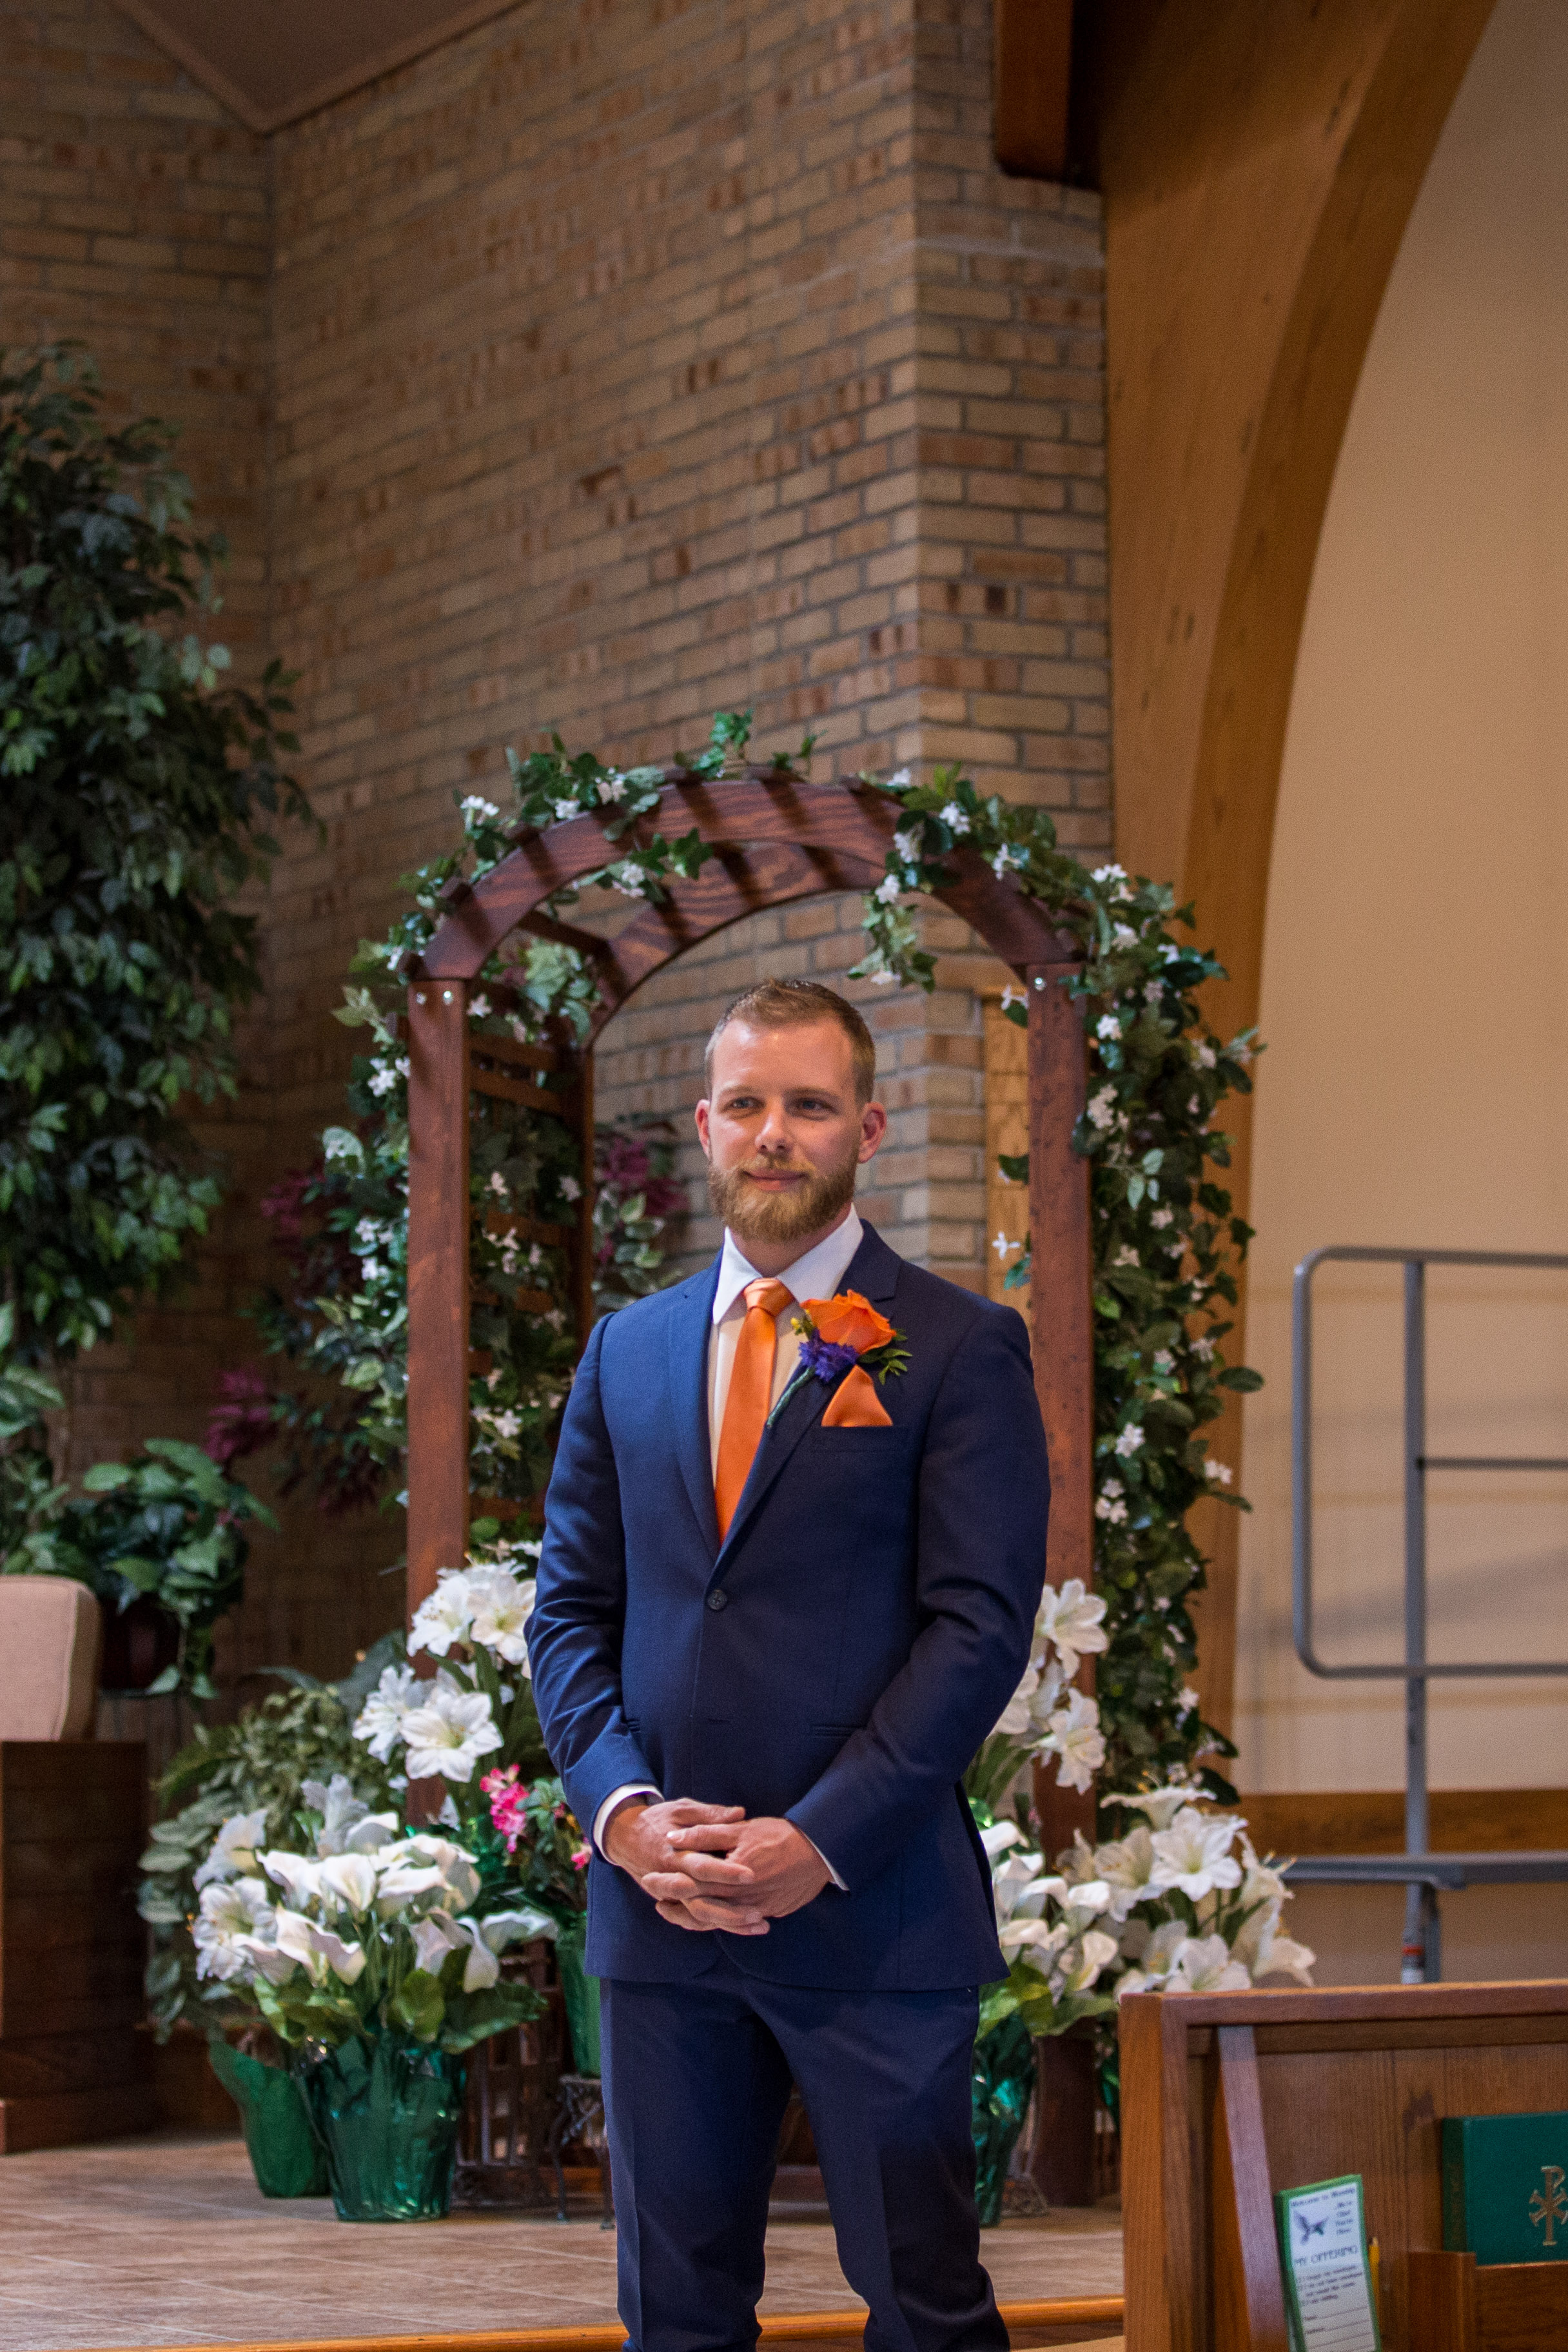 Natalie and Dallas Mooney Wedding 6-8-19_Tania Watt Photography-56.jpg